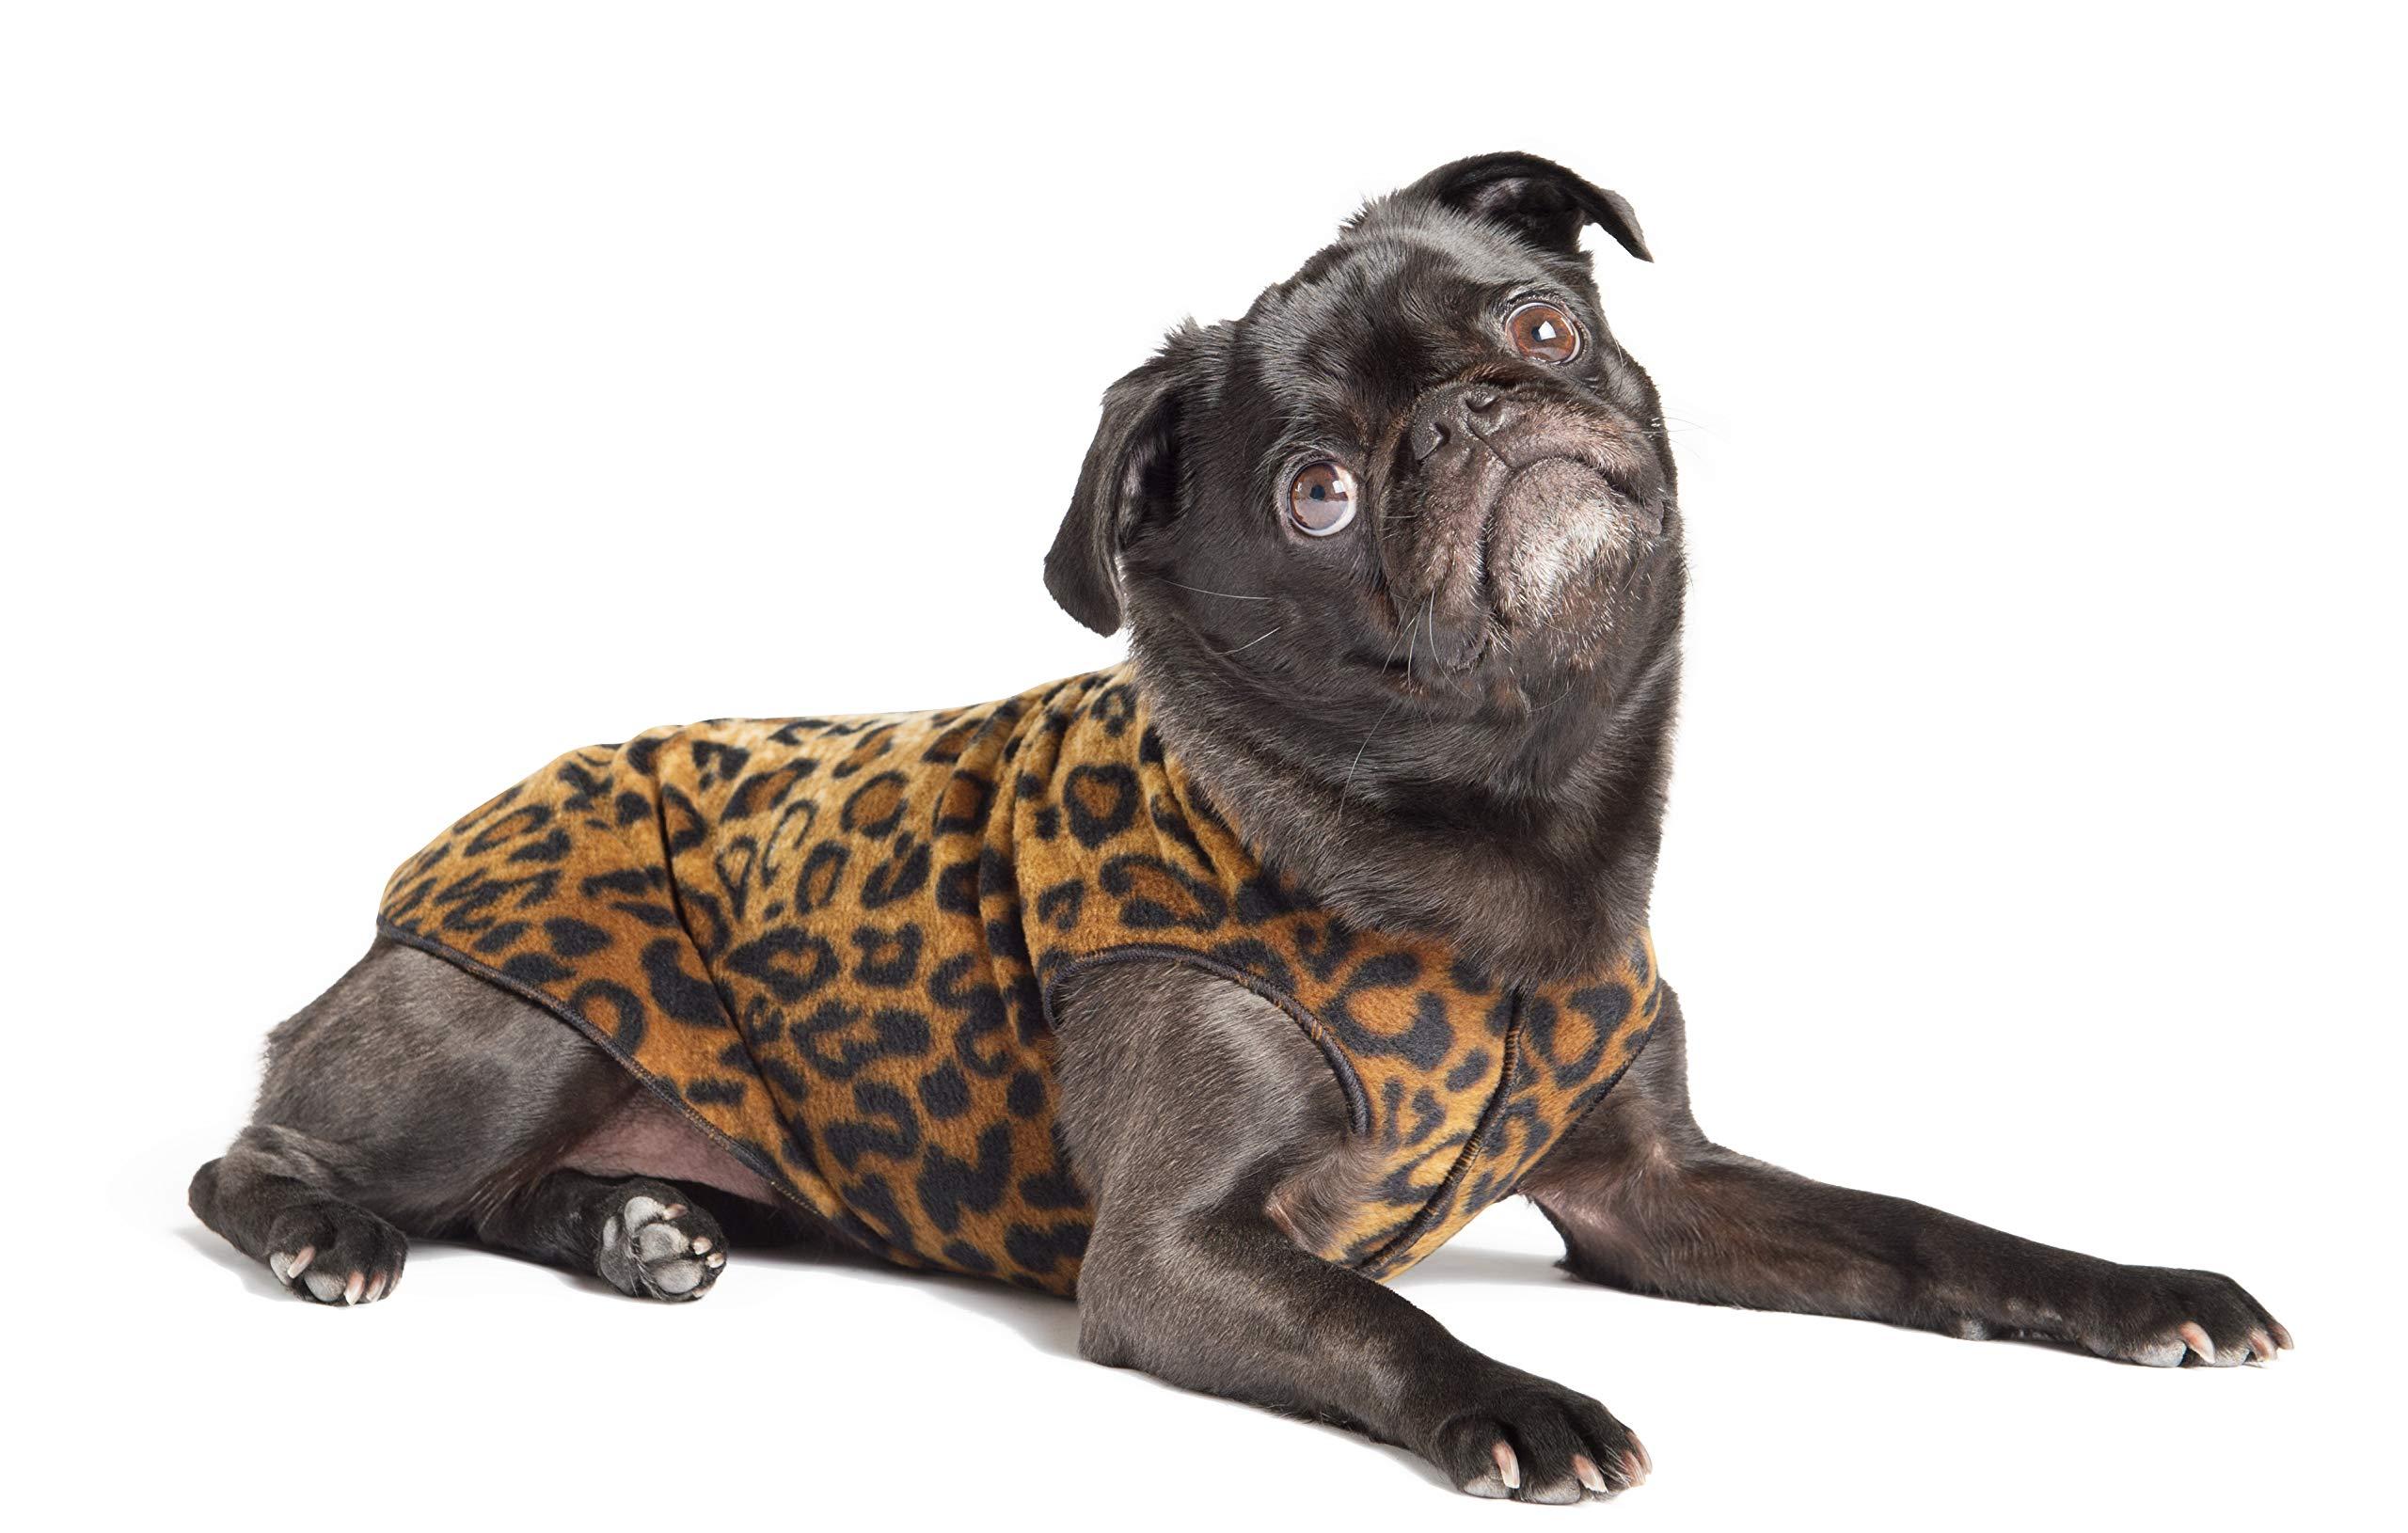 Gold Paw Stretch Fleece Dog Coat – Soft, Warm Dog Clothes, Stretchy Pet Sweater – Machine Washable, Eco Friendly – All Season – Sizes 2-30, Black, Size 2